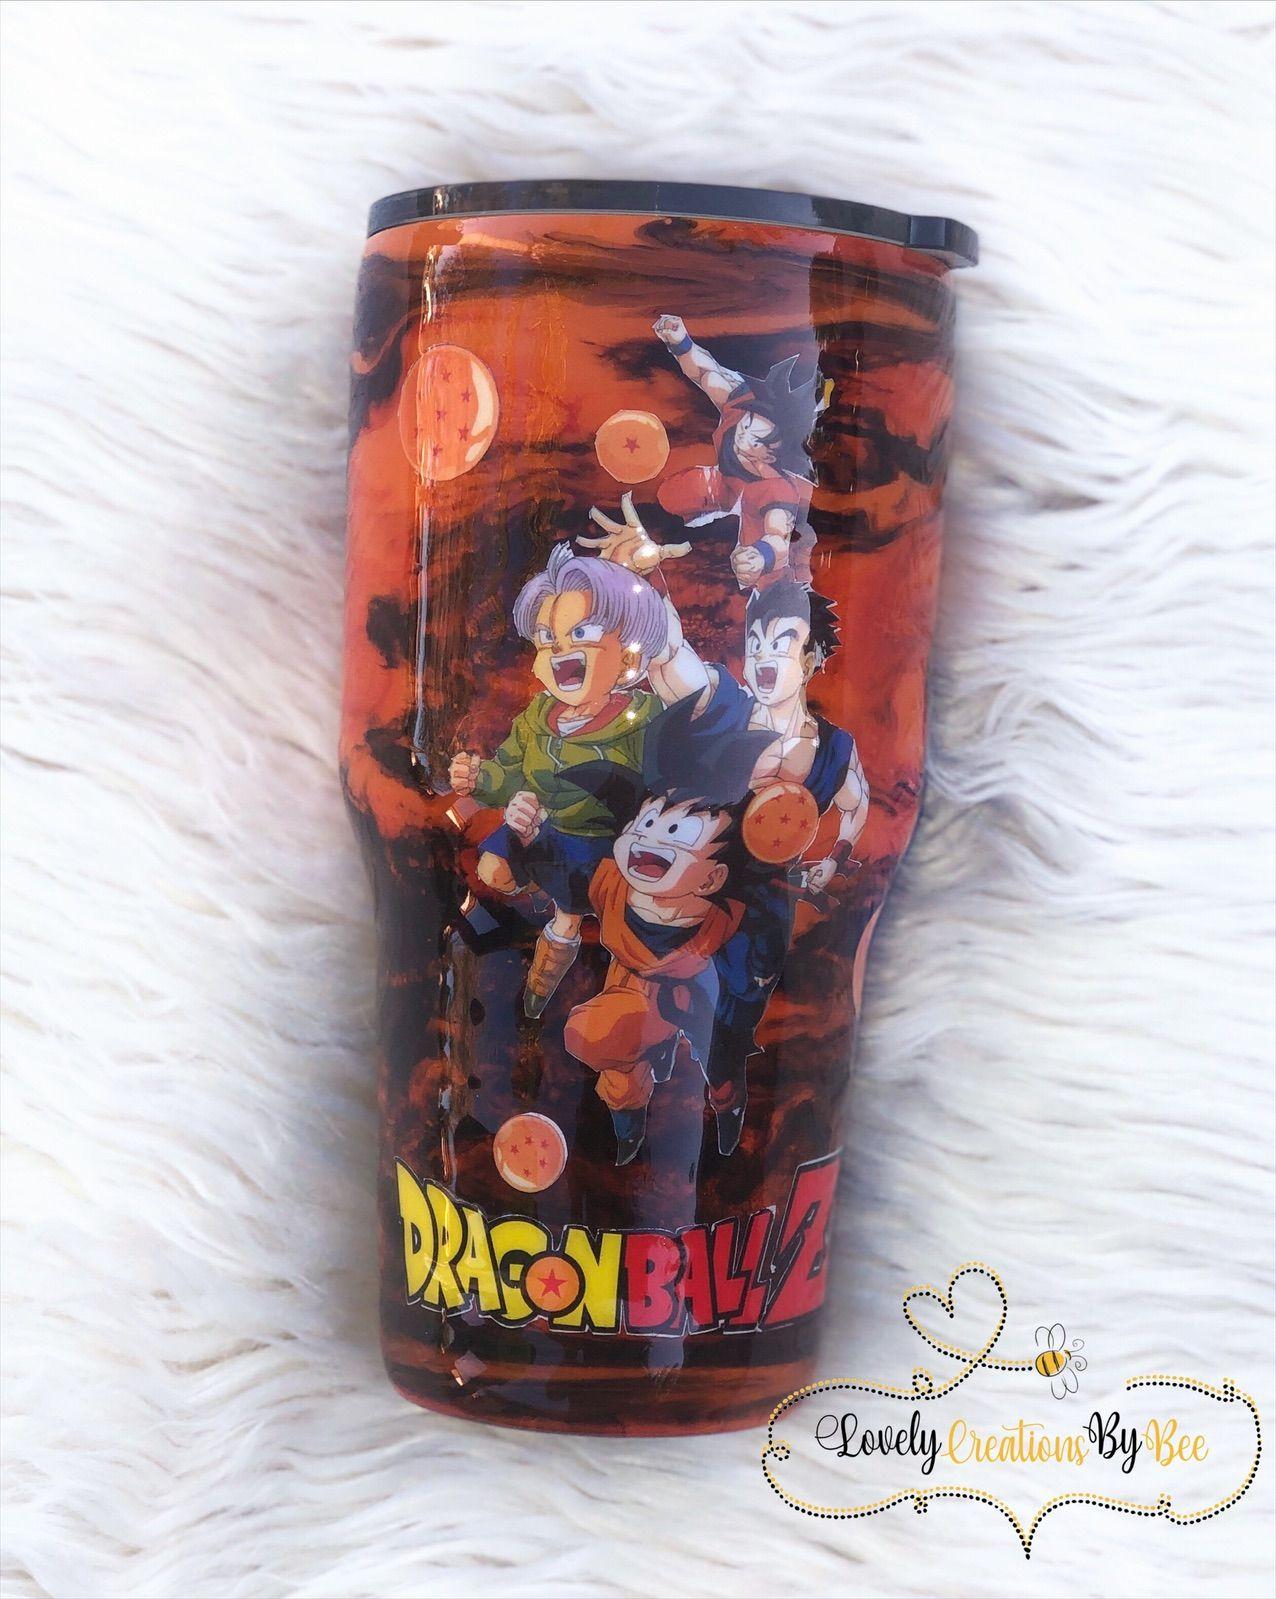 Dragon Ball Z Tumbler Tumbler Cups Diy Cup Crafts Glitter Cups